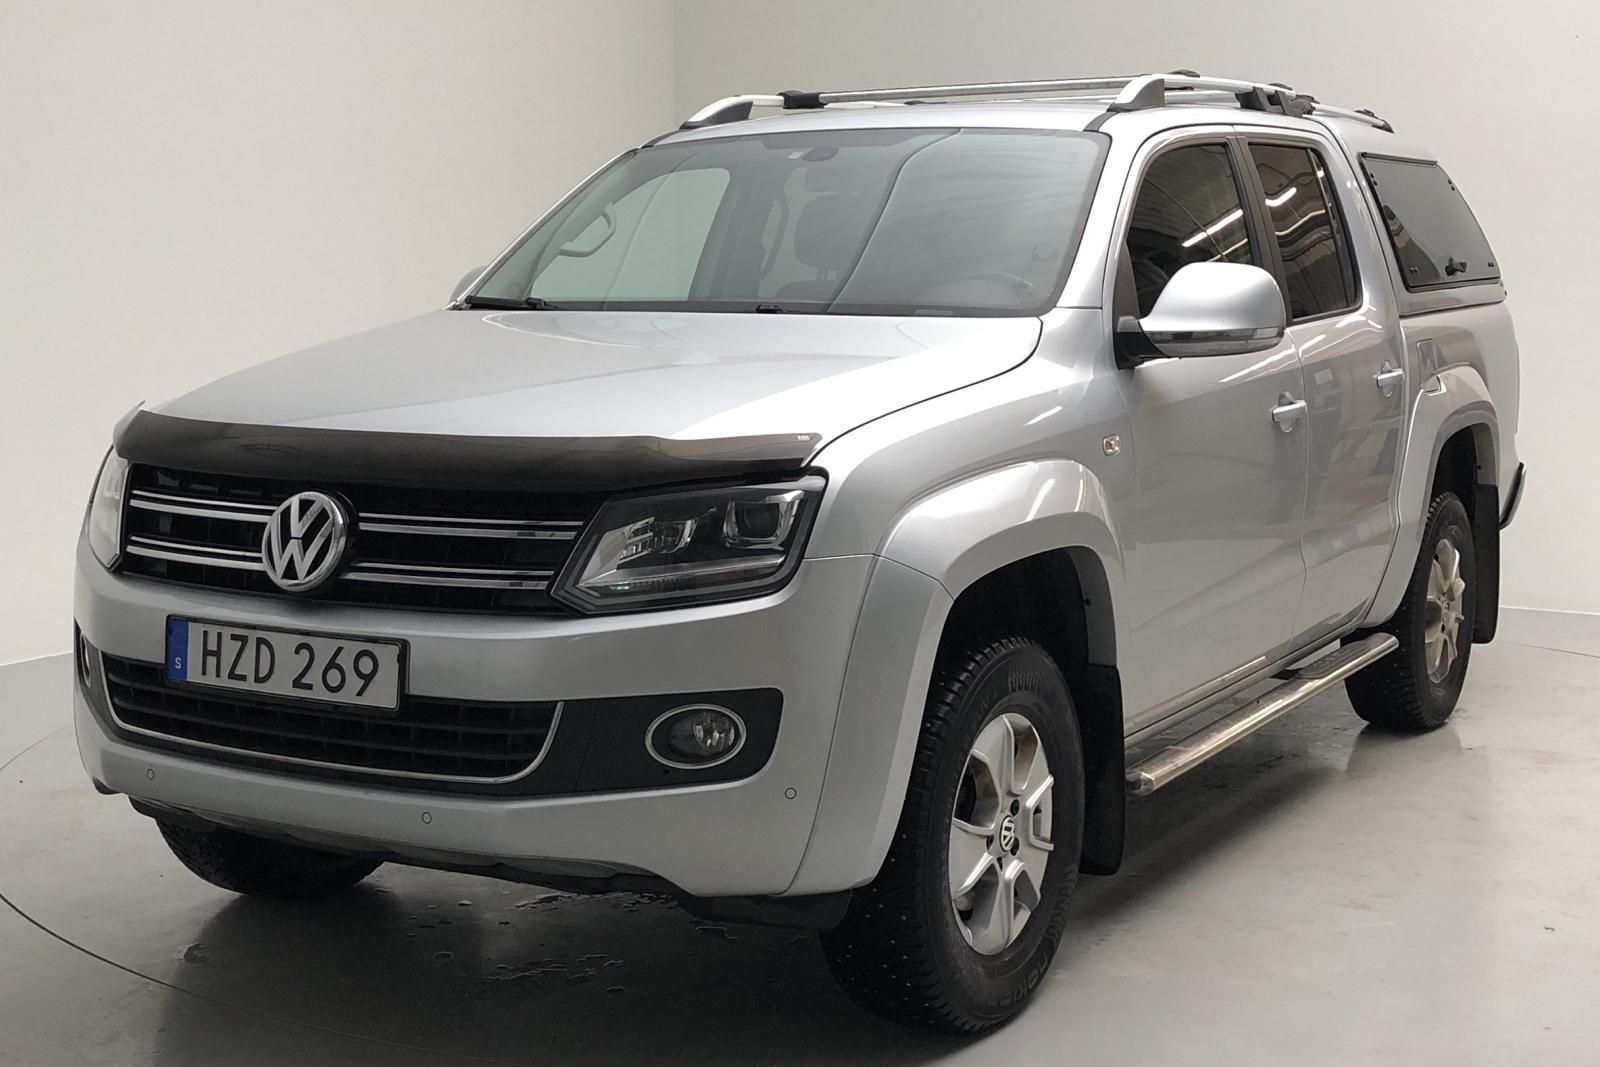 VW Amarok 2.0 TDI 4motion (180hk)